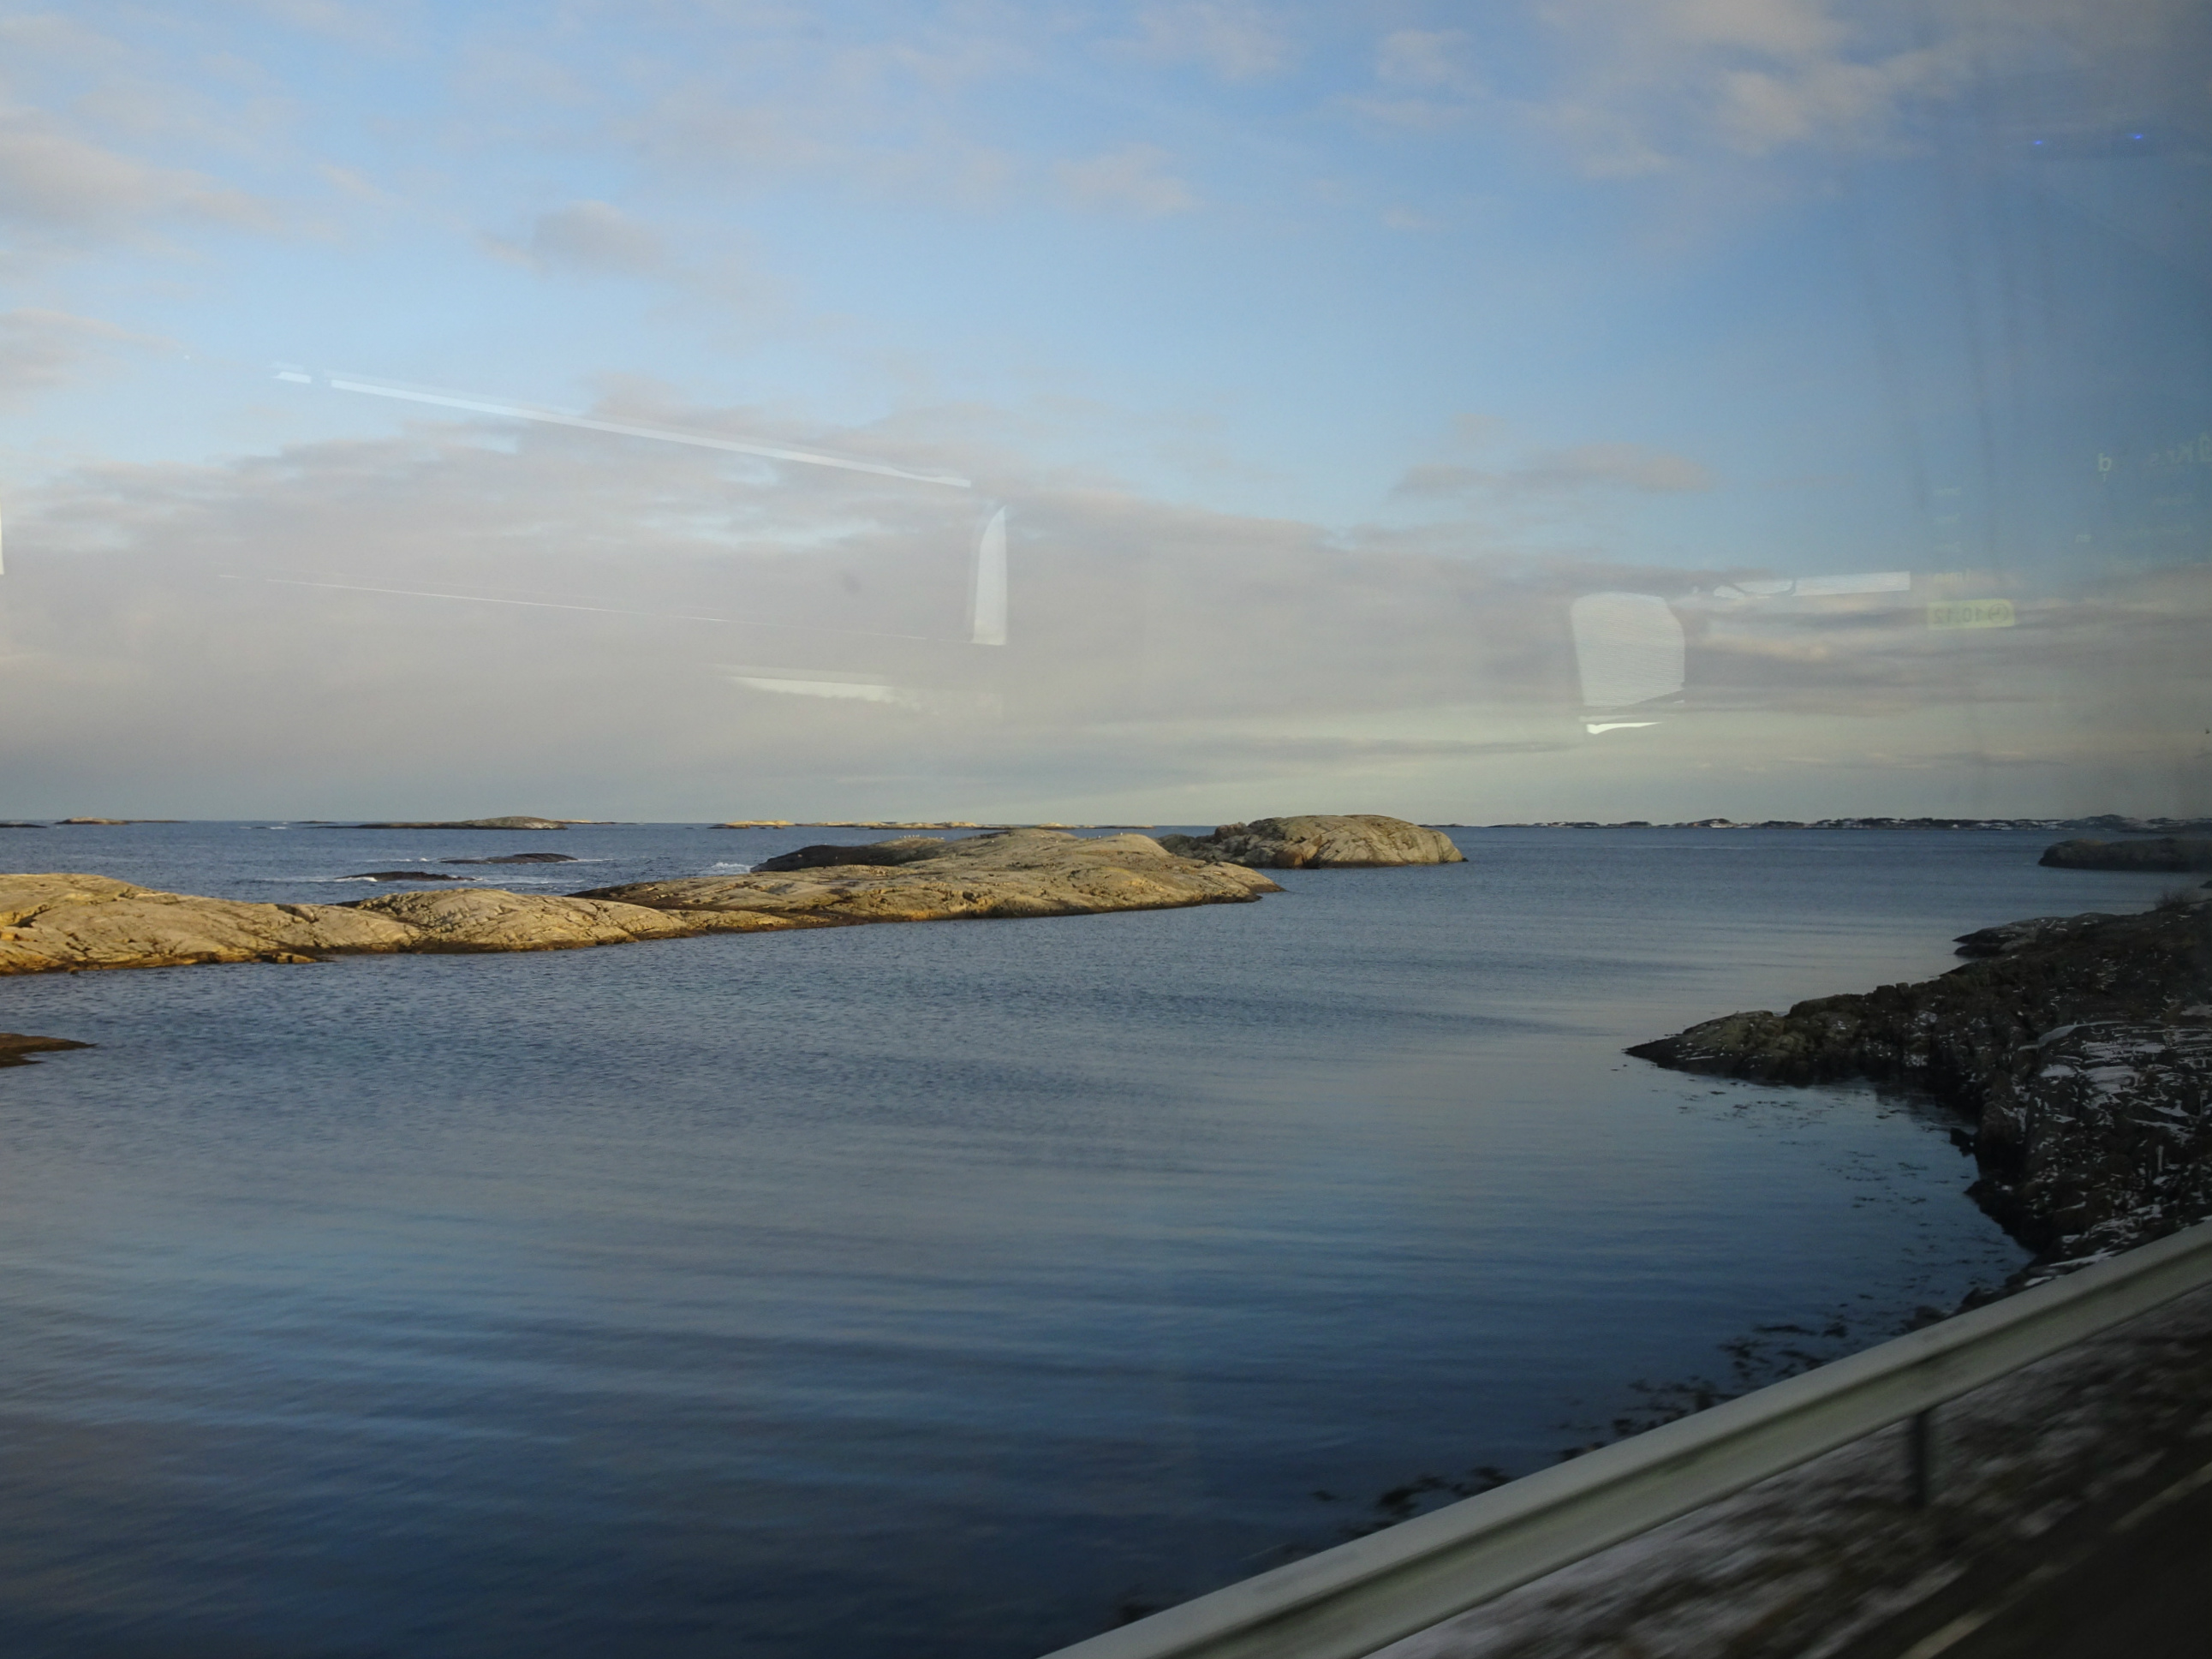 Norway. Atlanterhavsvegen (Atlantic Road)